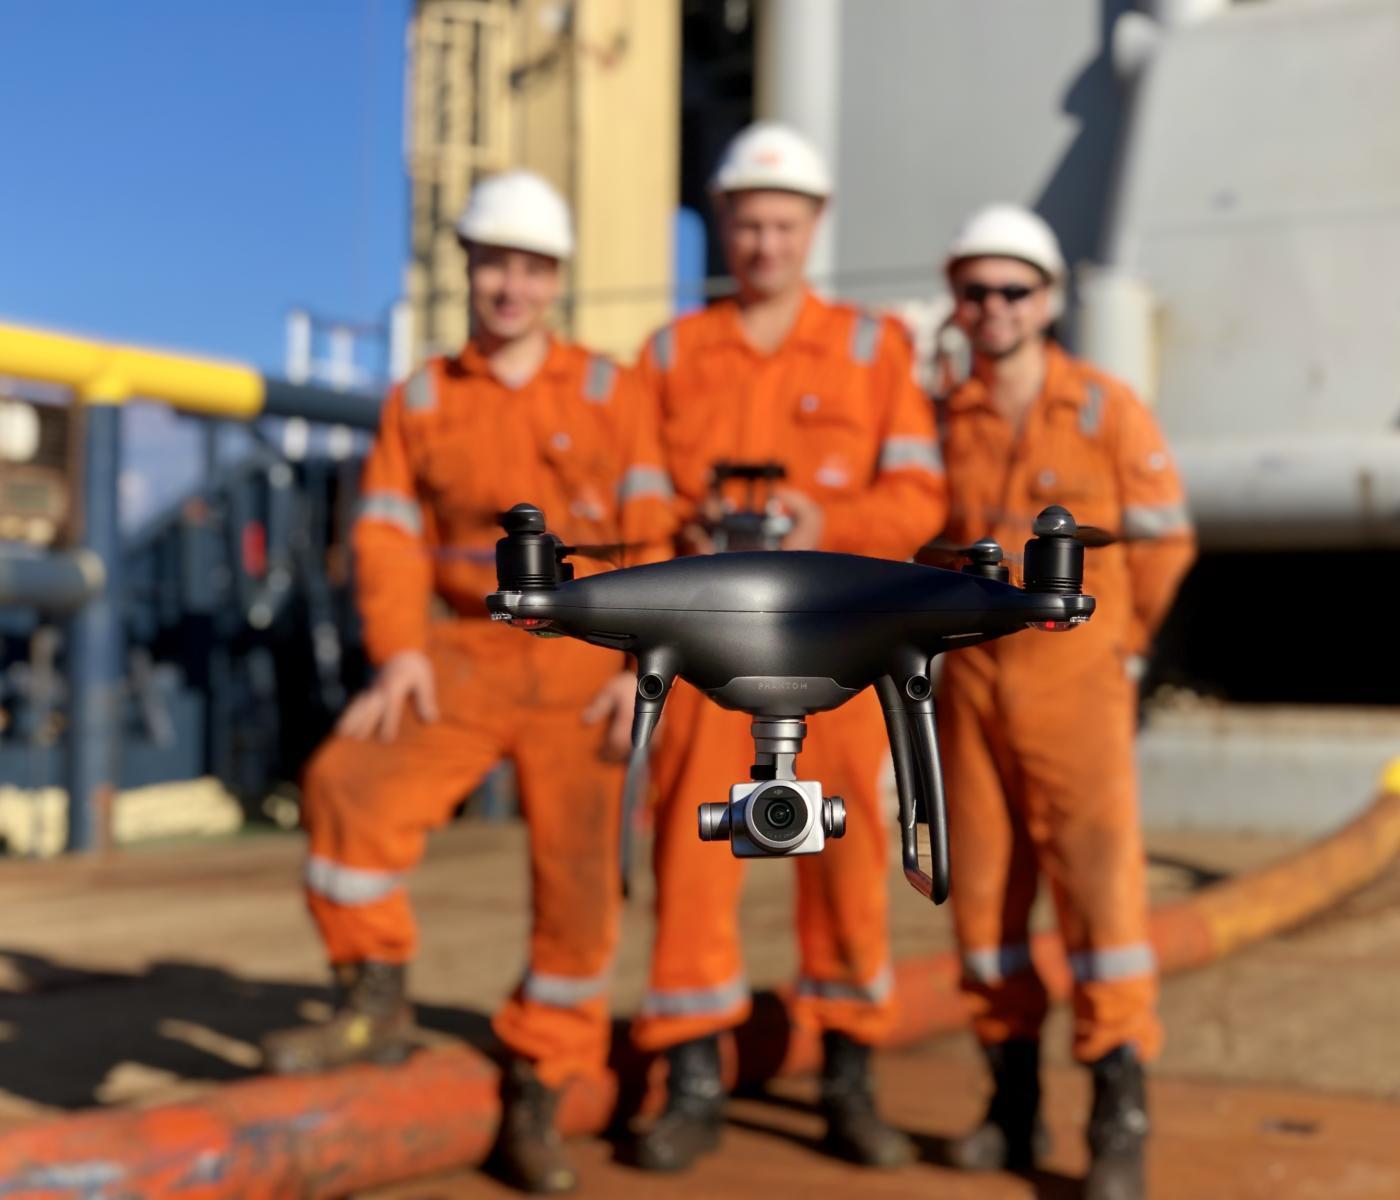 Drone_ALP_monitoring_crew_man_centre.jpg